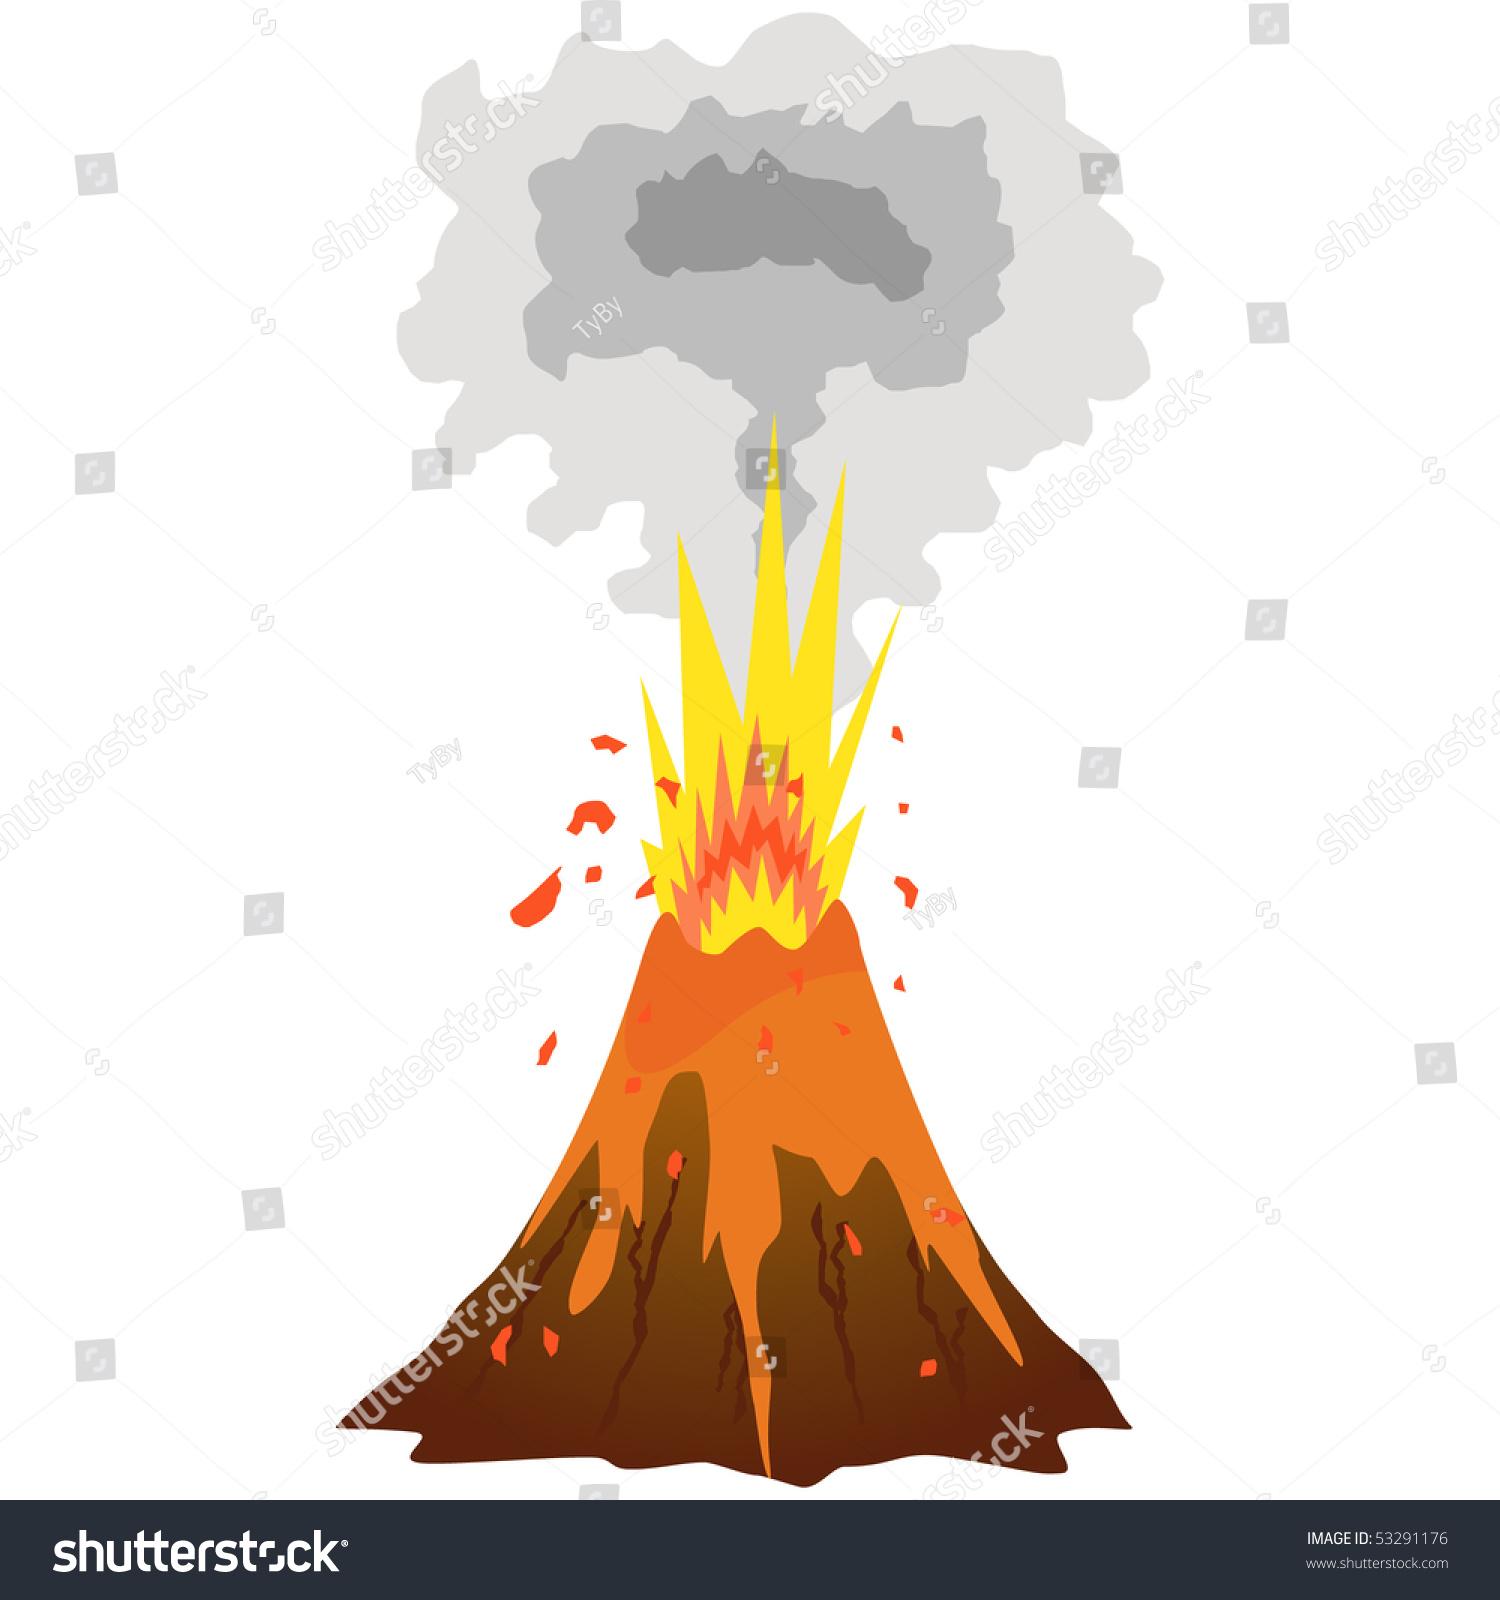 free clipart volcano erupting - photo #47